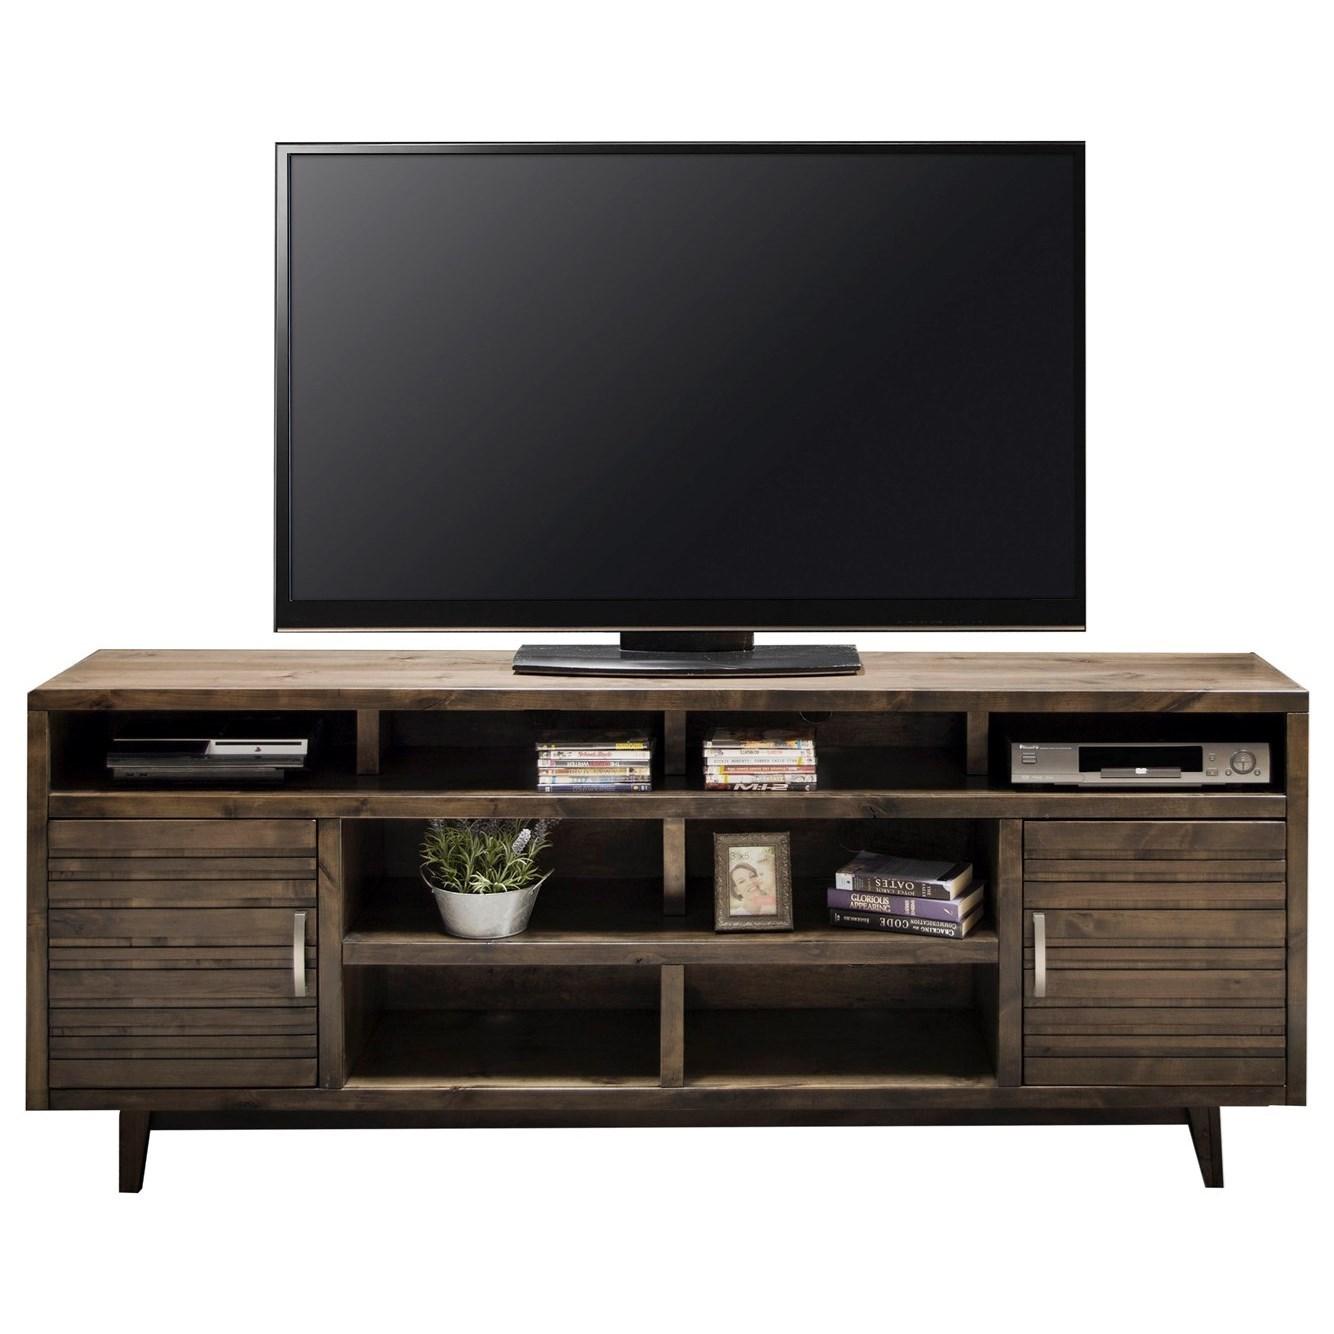 "Avondale 84"" TV Console by Legends Furniture at Darvin Furniture"